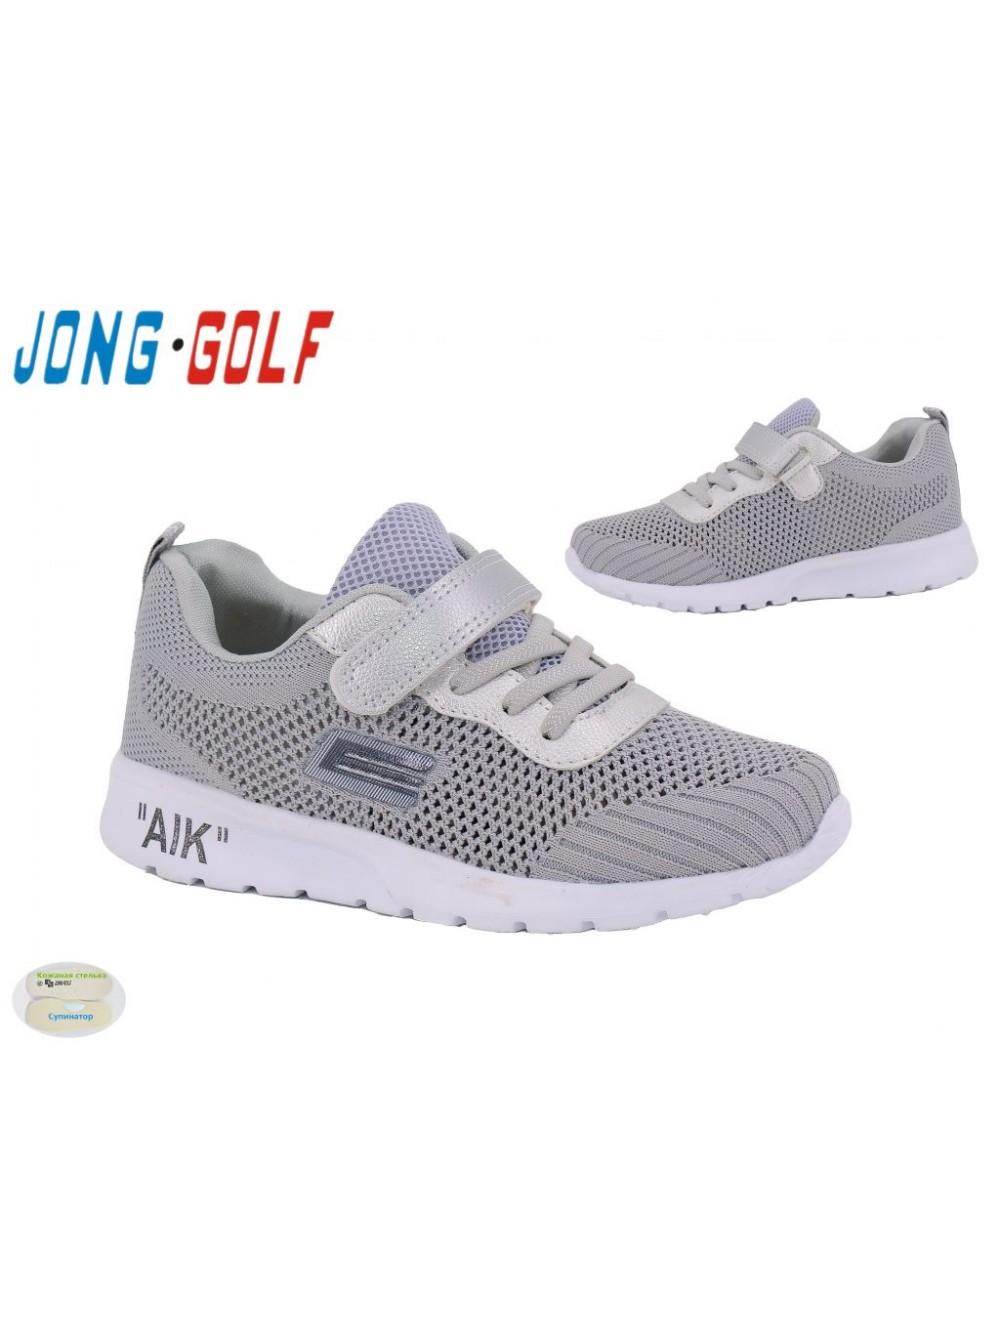 591cd4f3 Кроссовки Jong Golf детские серые летние | Суперцена | KED.NET.UA